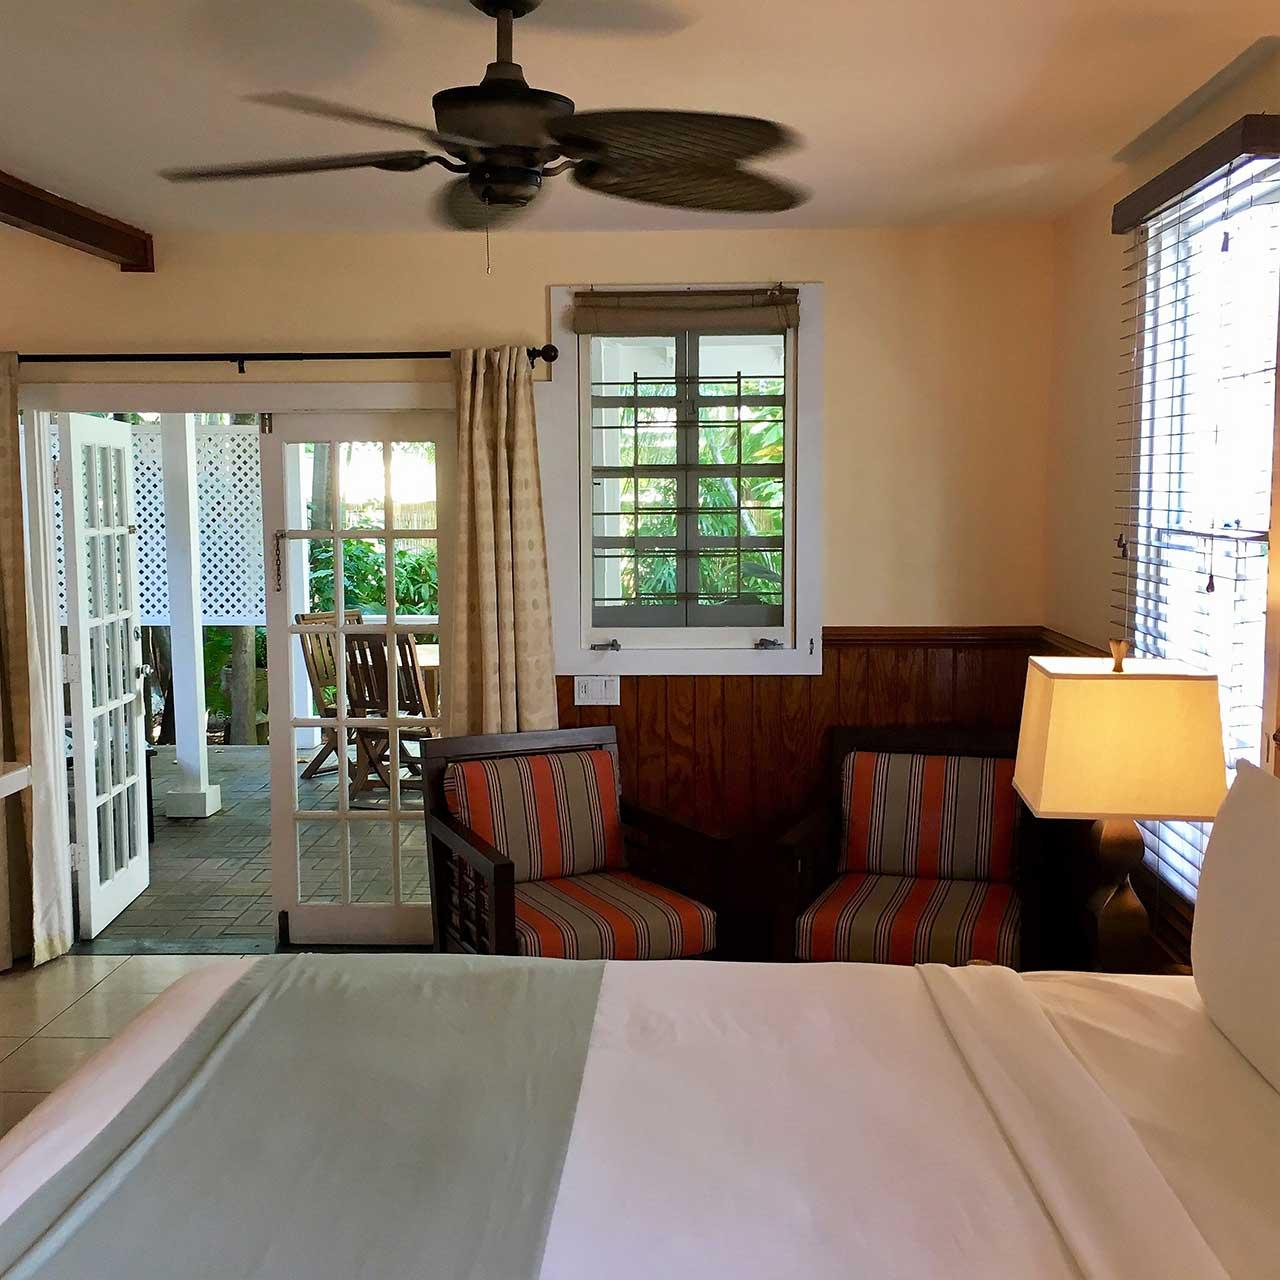 douglas house key west guest house vacation rentals. Black Bedroom Furniture Sets. Home Design Ideas